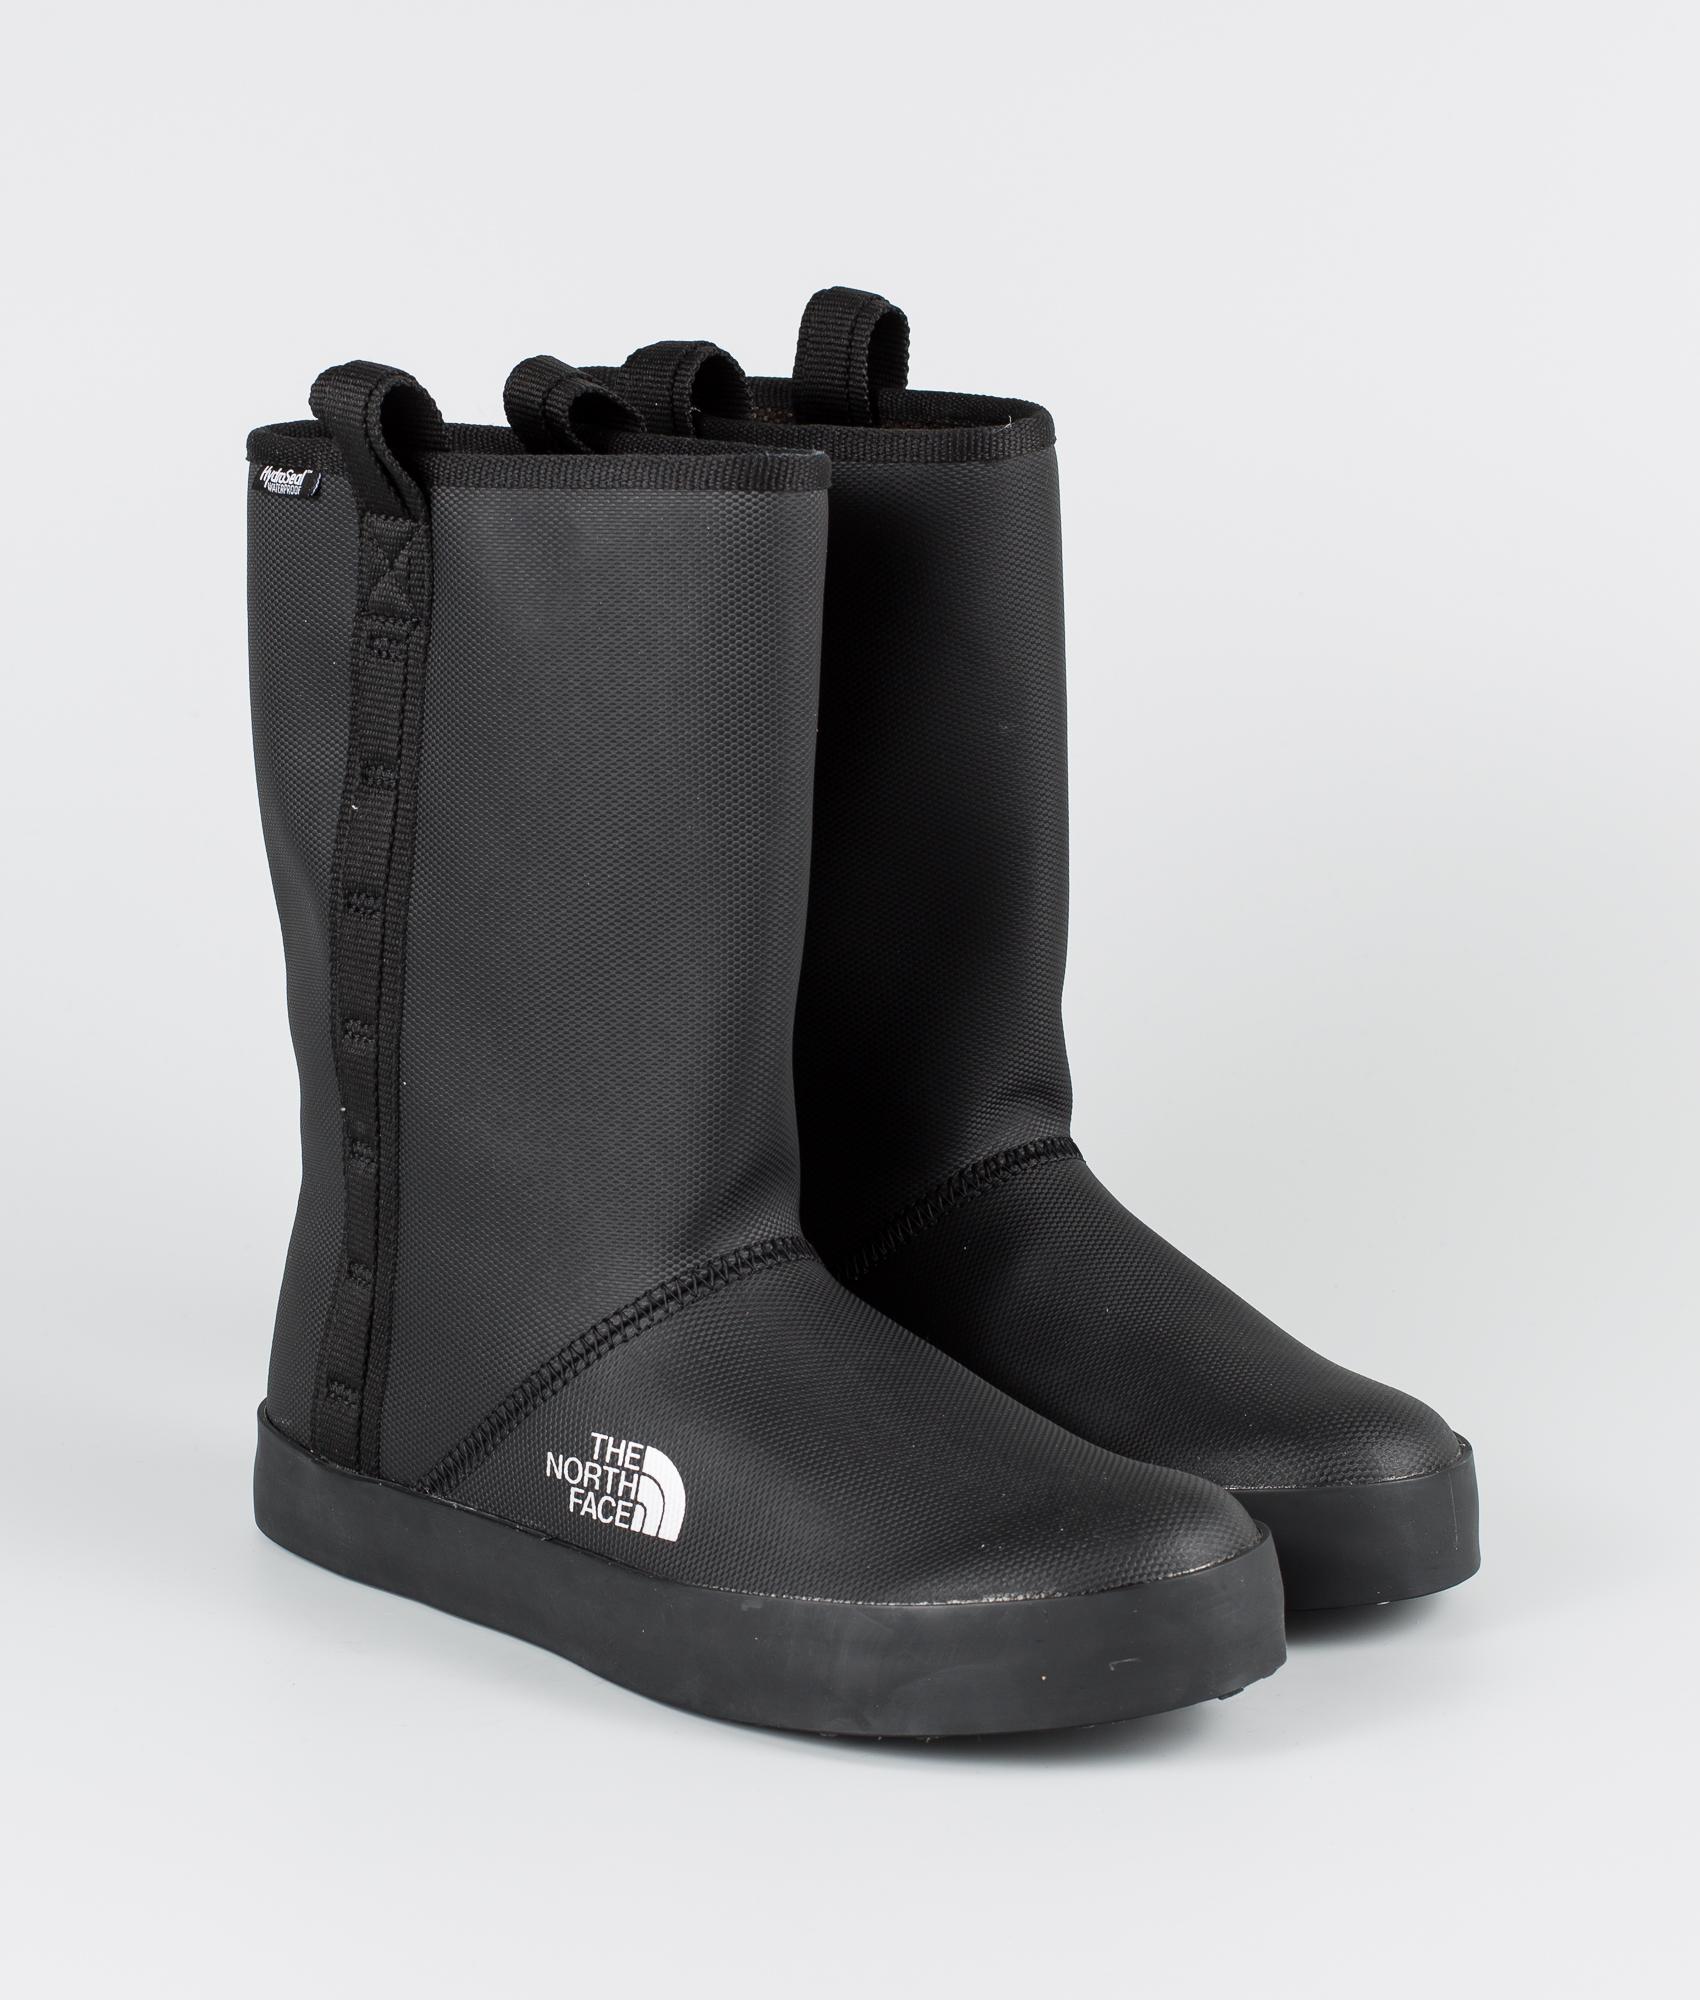 The North Face W Bscmp Rain Bt Shrt Schuhe Tnf BlackTnf Black